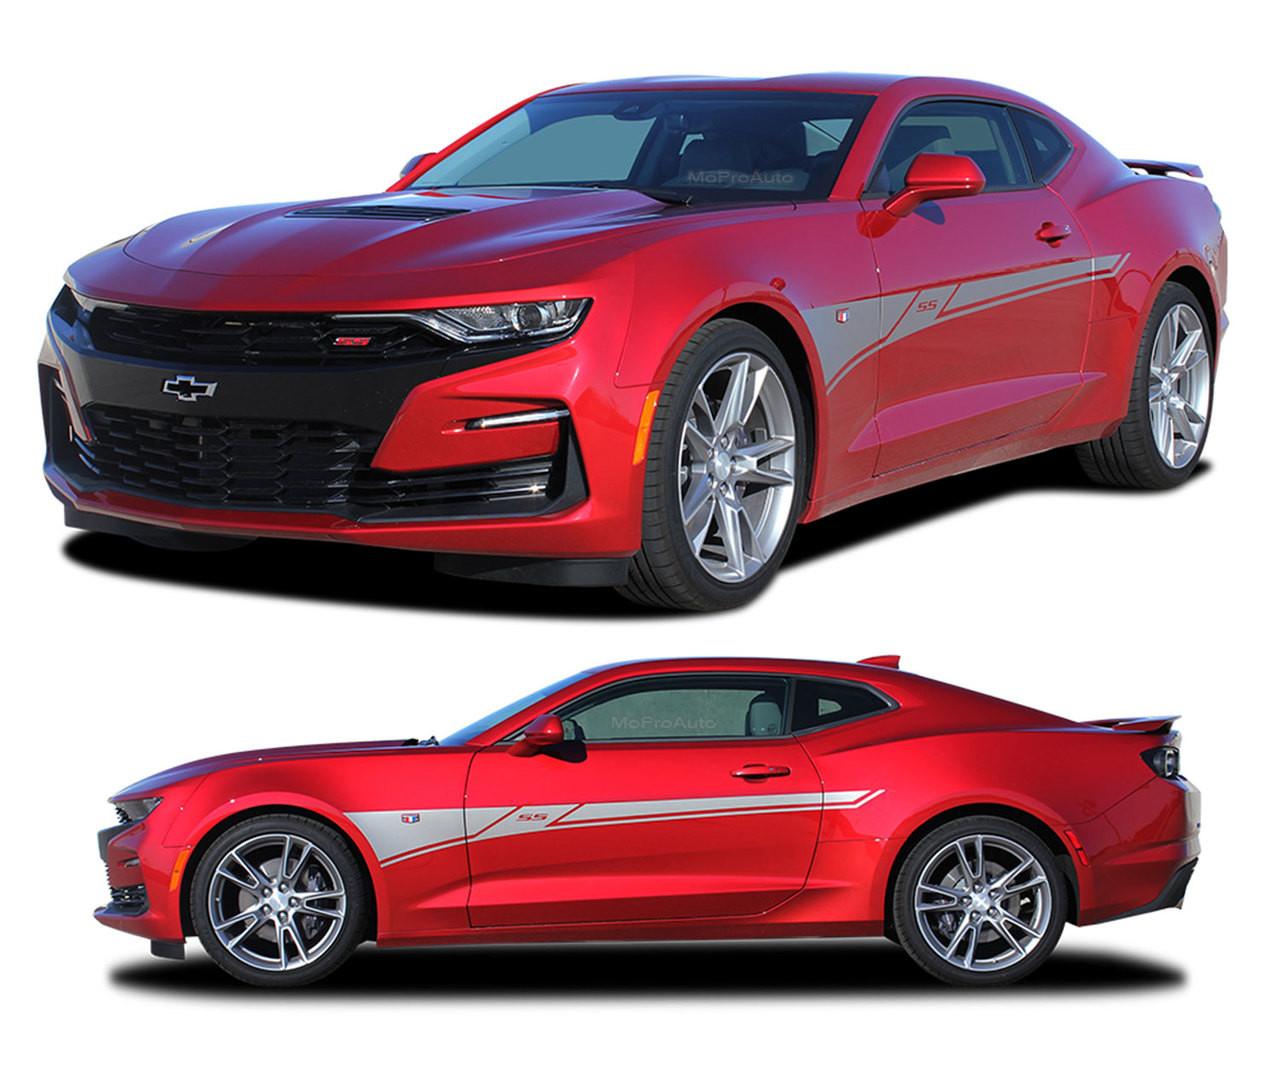 2019 2020 camaro door decal backlash chevy camaro side body stripes decals vinyl graphics kit m pds 6001